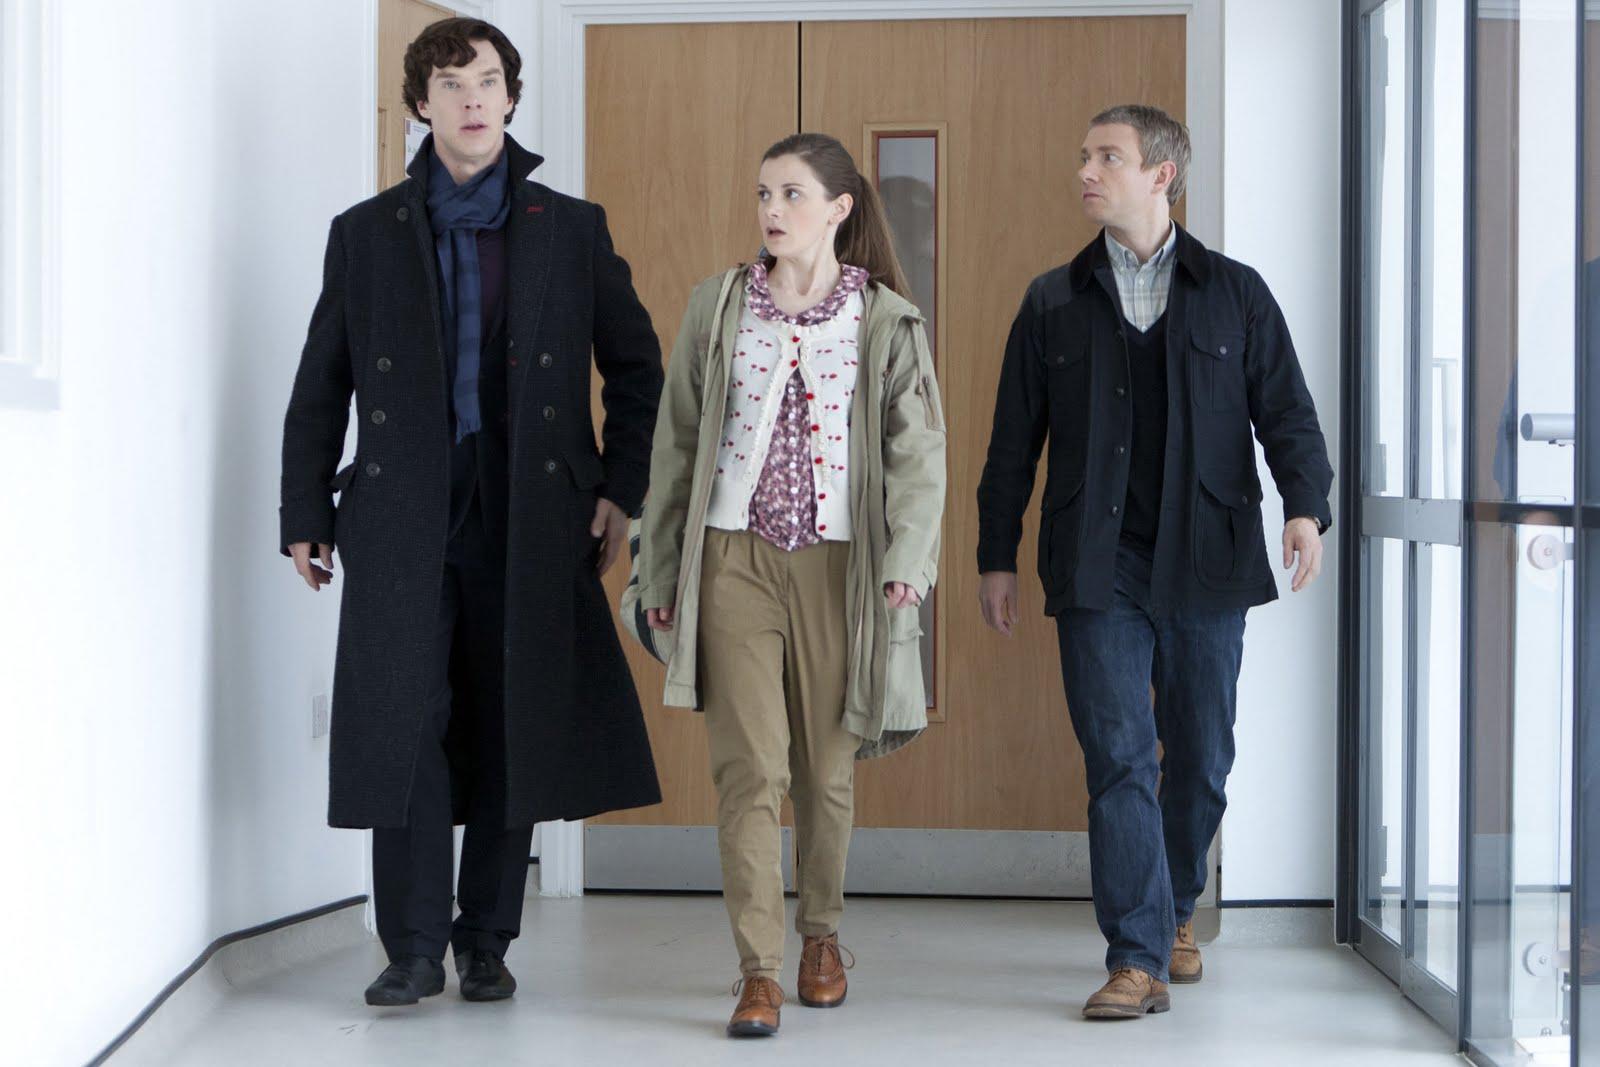 Episodio 3 - La Caída de Reichenbach Sher5